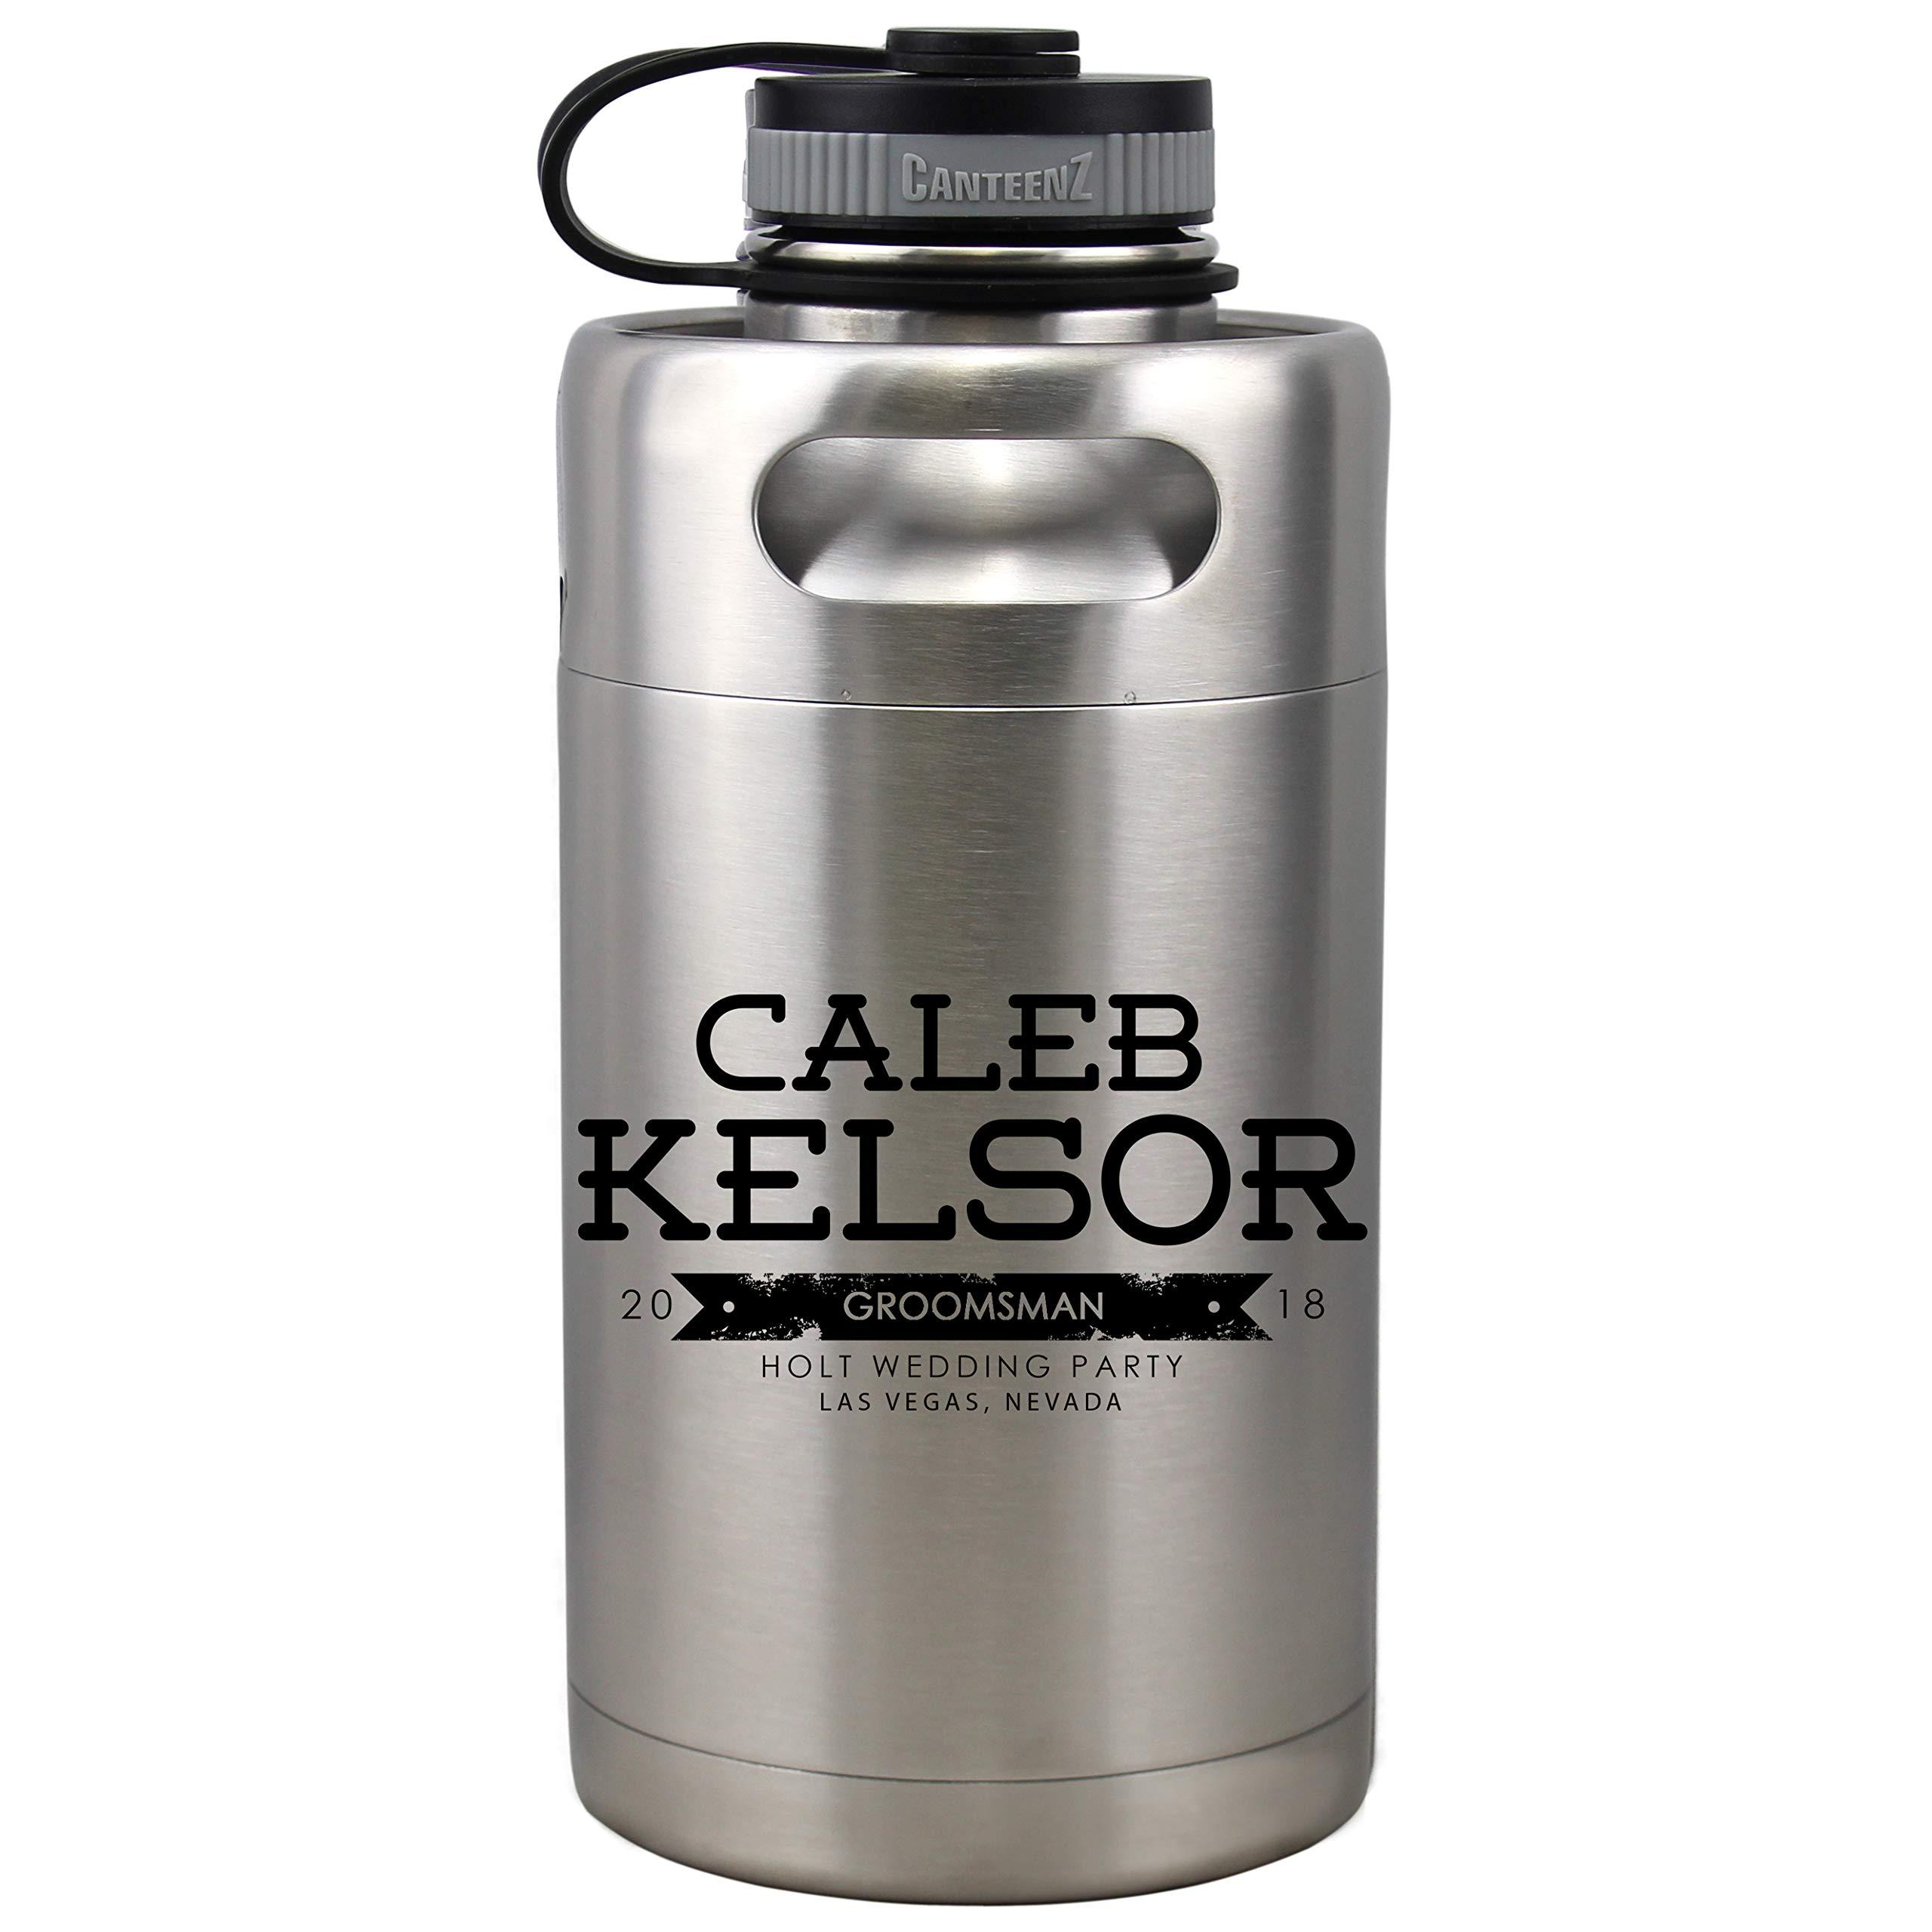 Personalized Etched Insulated Beer Growler 64oz Keg Groomsmen Gifts (Kelsor Design)